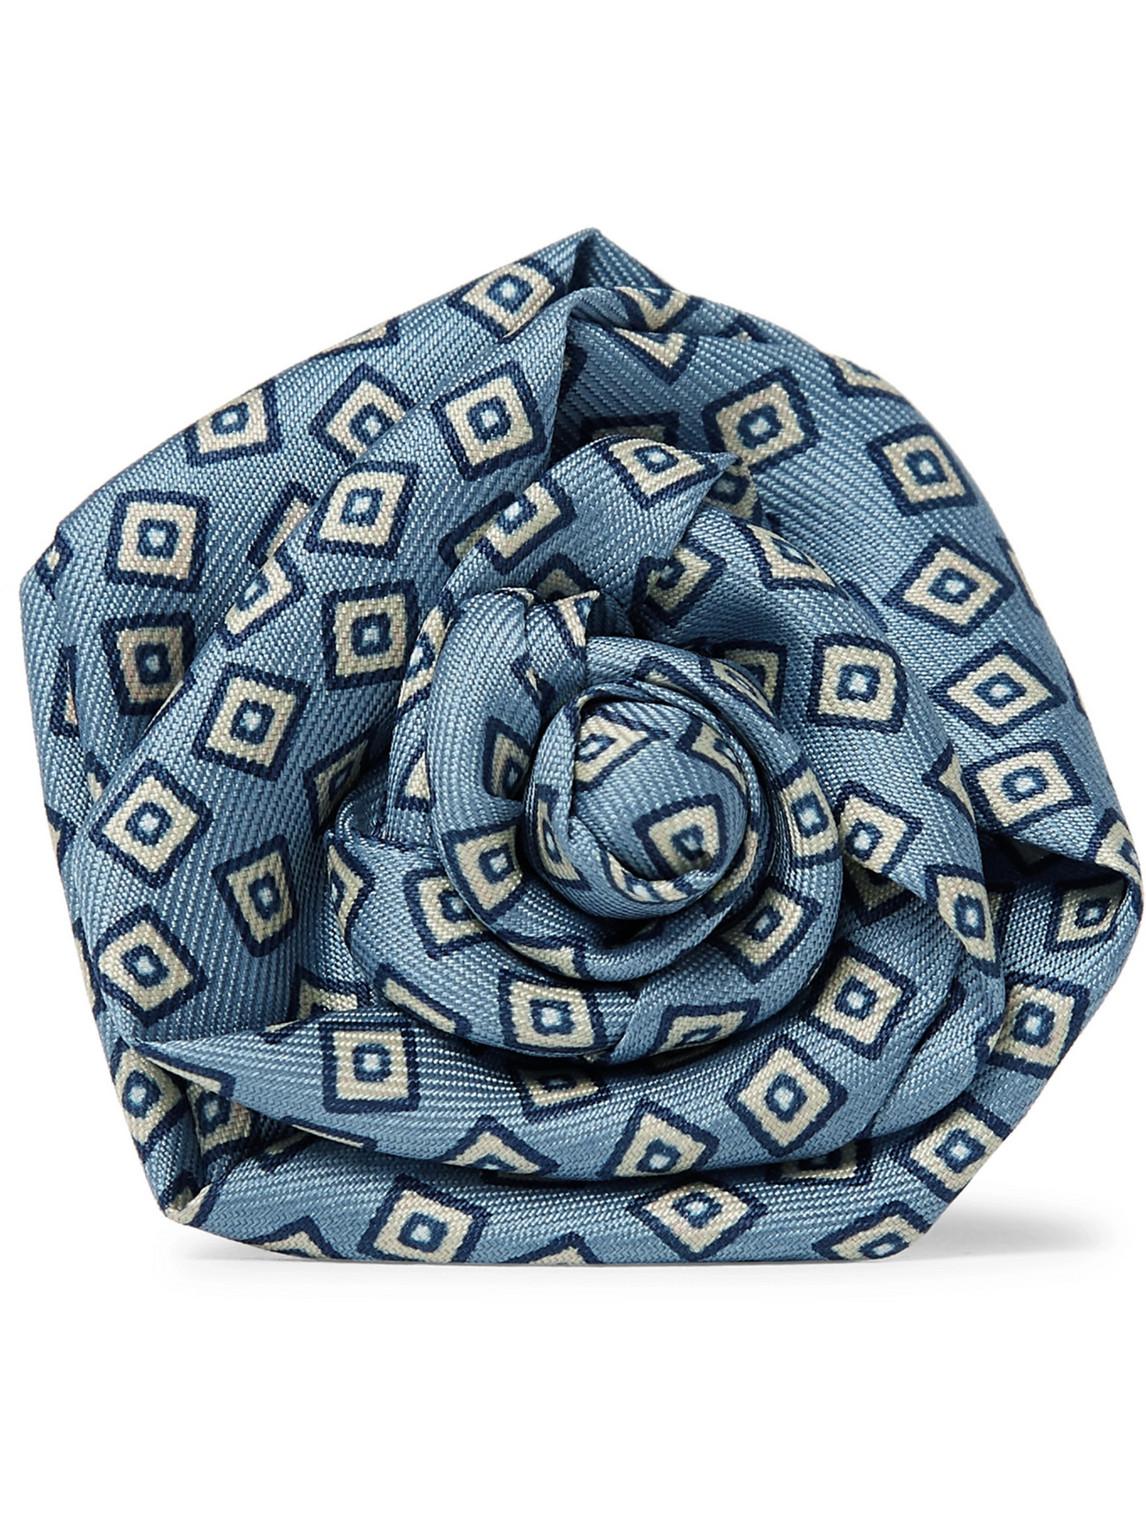 charvet - printed silk-faille flower lapel pin - men - blue